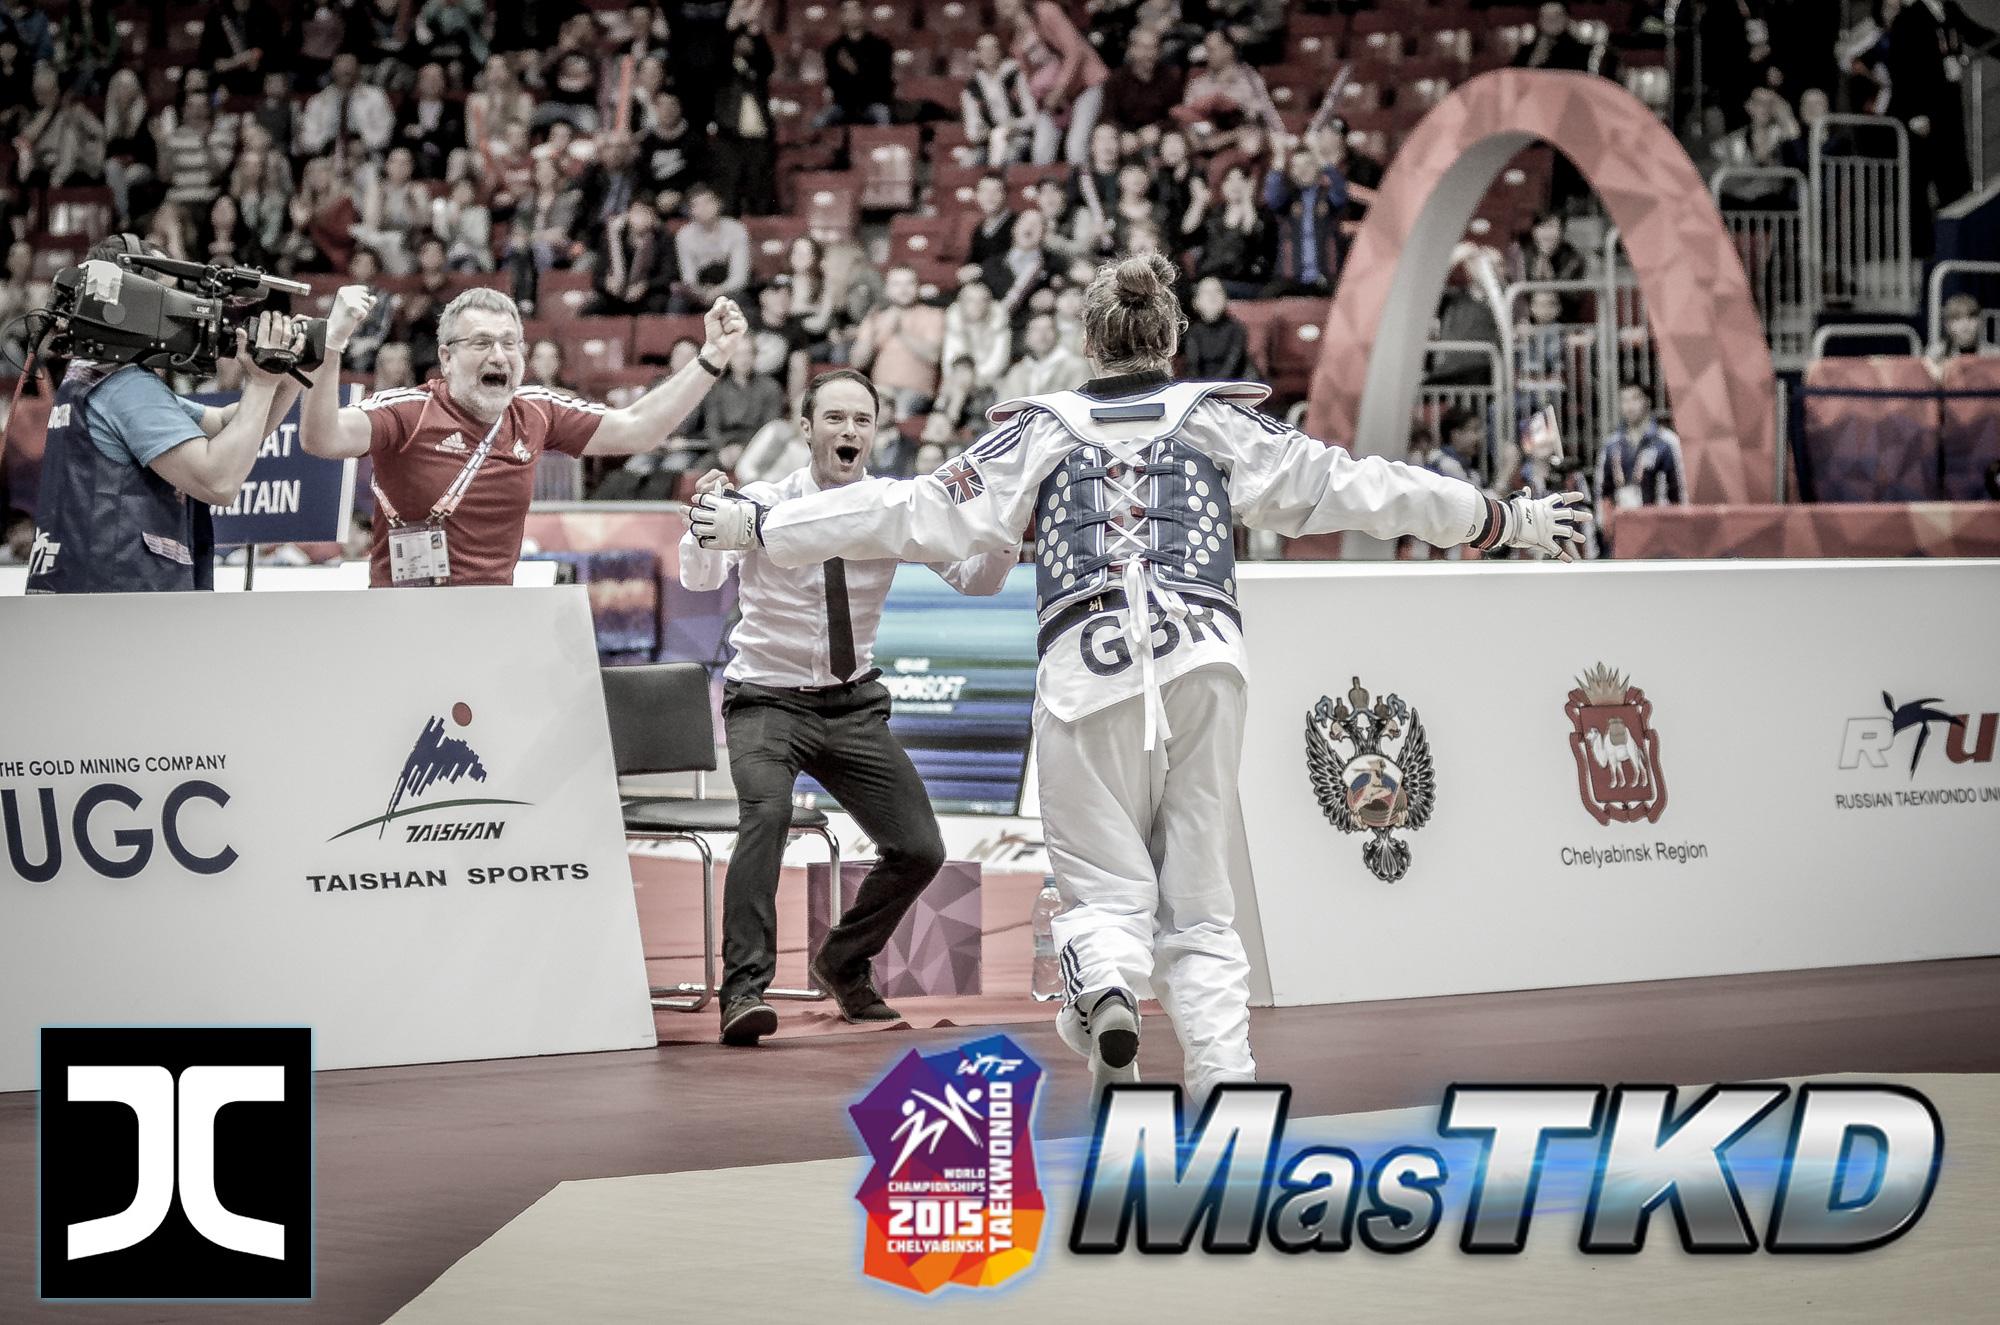 13_JCalicu-Mejores-imagenes-del-Mundial-de-Taekwondo_d5